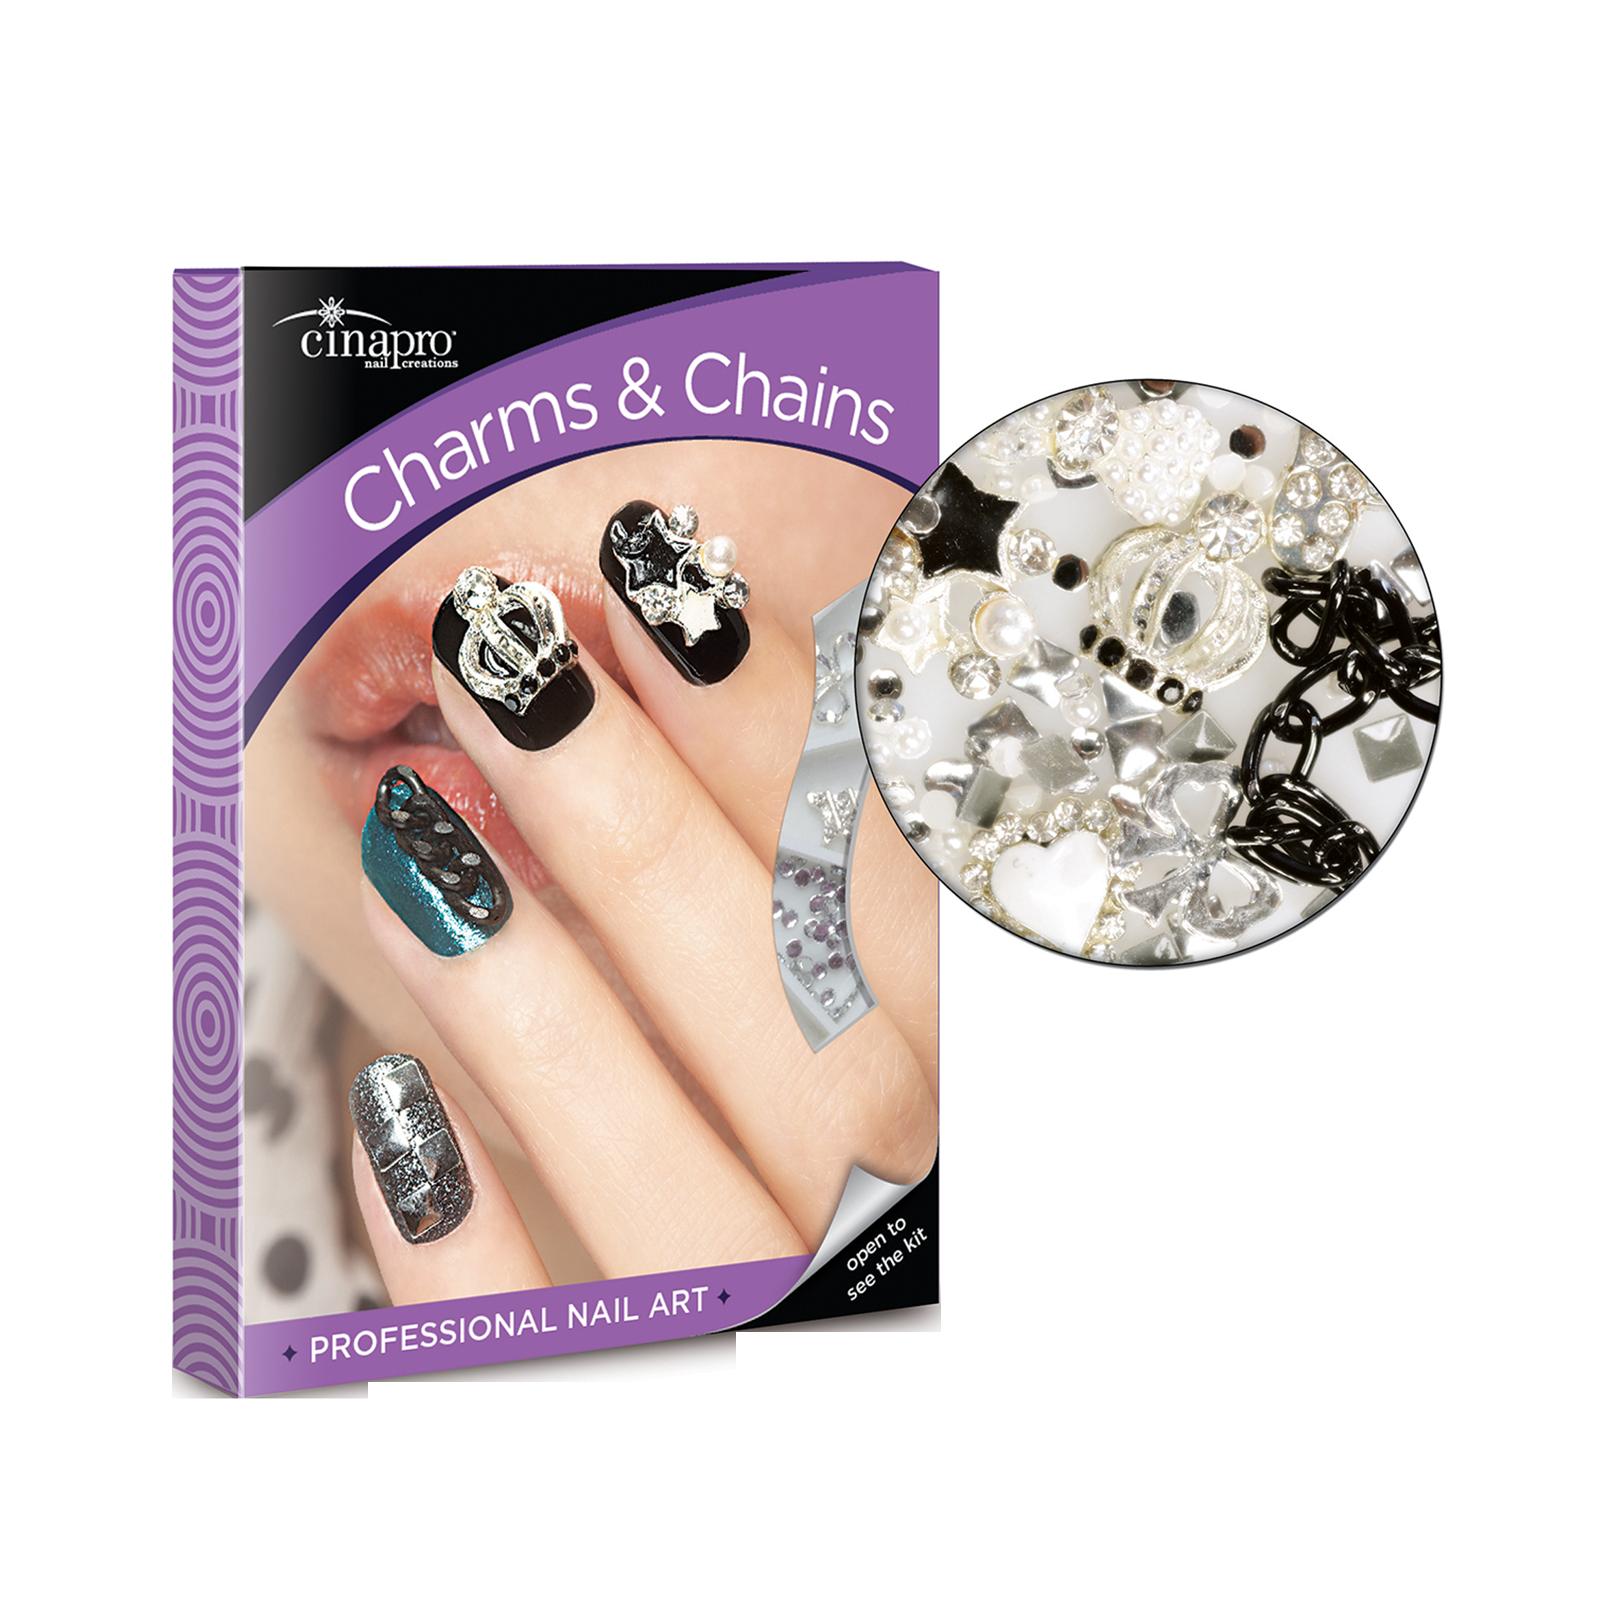 Cinapro Professional Nail Art Kit Charms Chains Cuccio Cina Pro Star Pro Cosmoprof